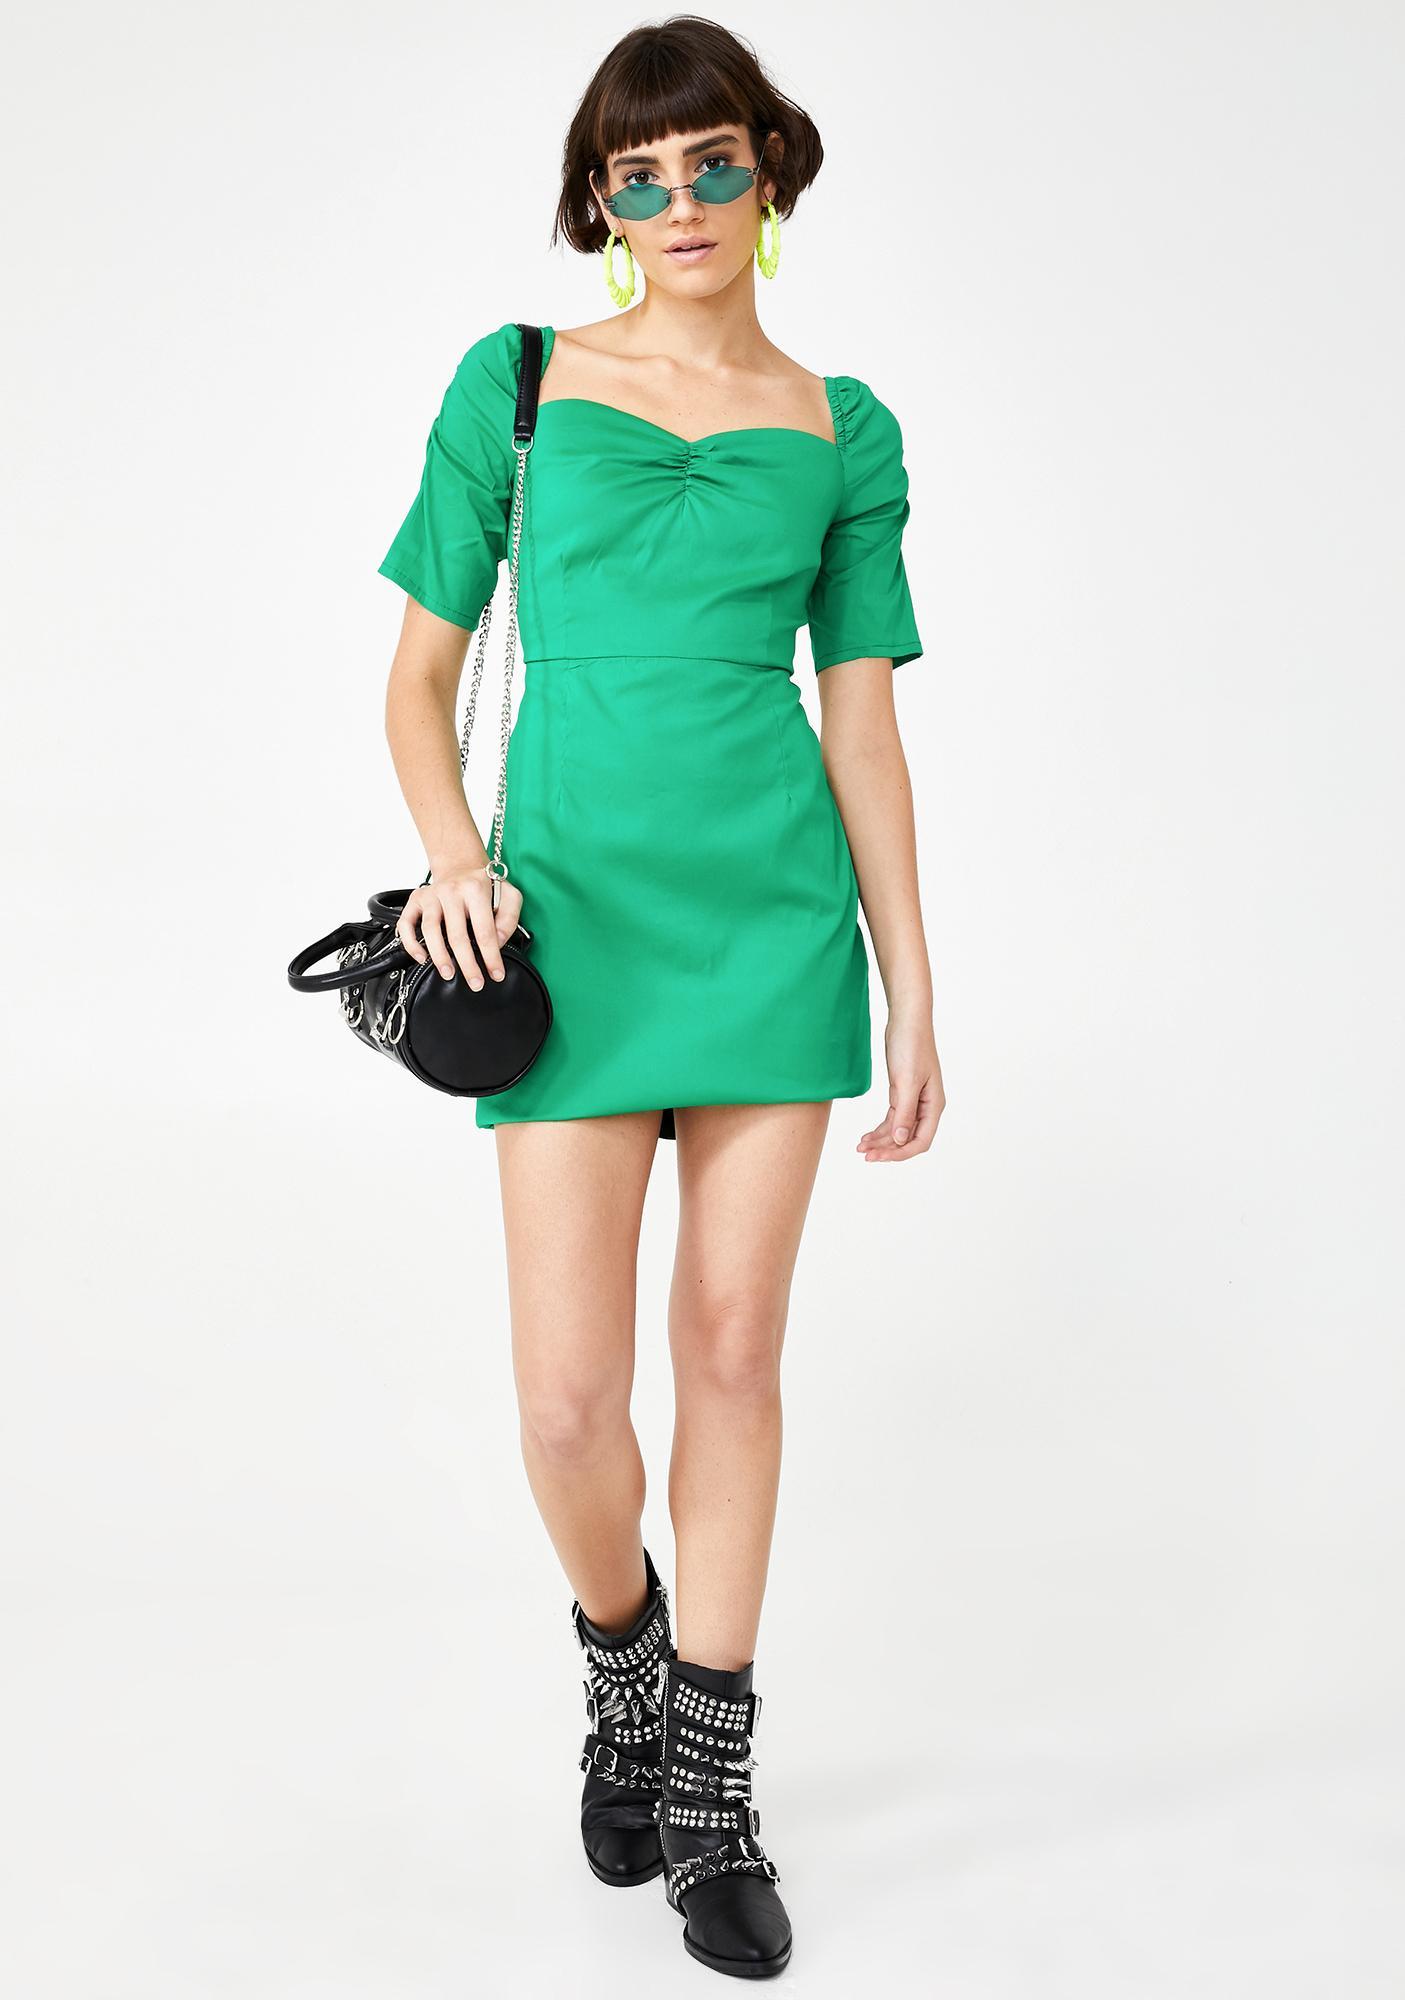 Glamorous Blissful Envy Mini Dress